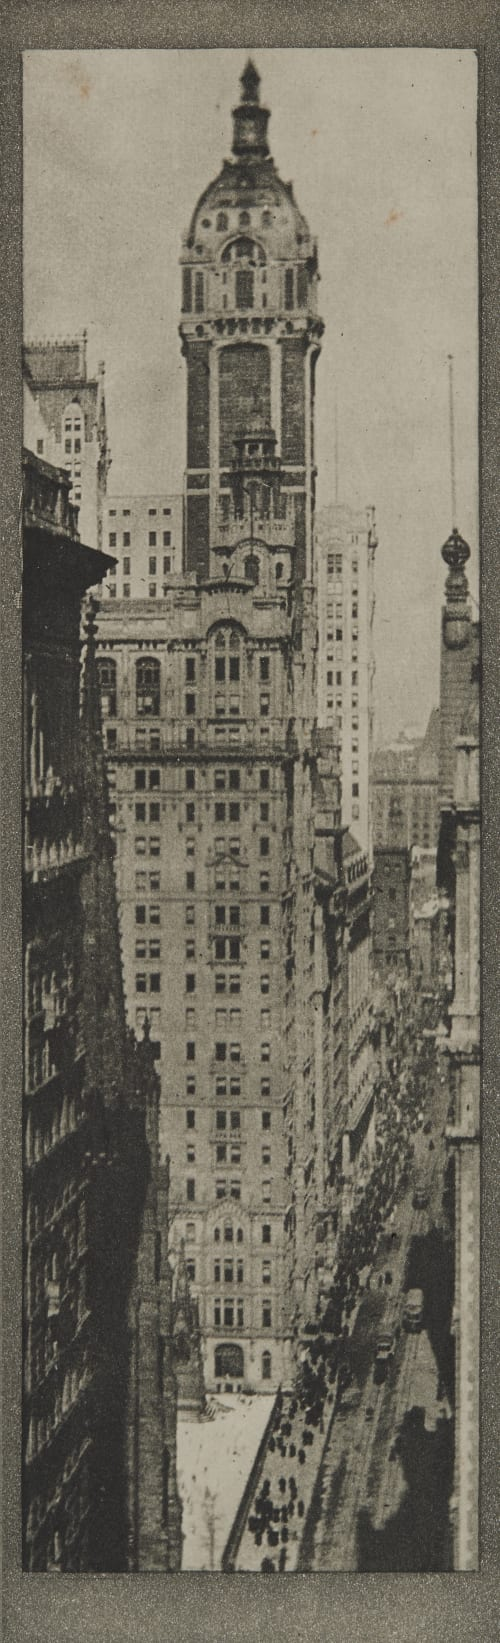 The Singer Building, Noon Coburn, Alvin Langdon  (American, 1882-1966)